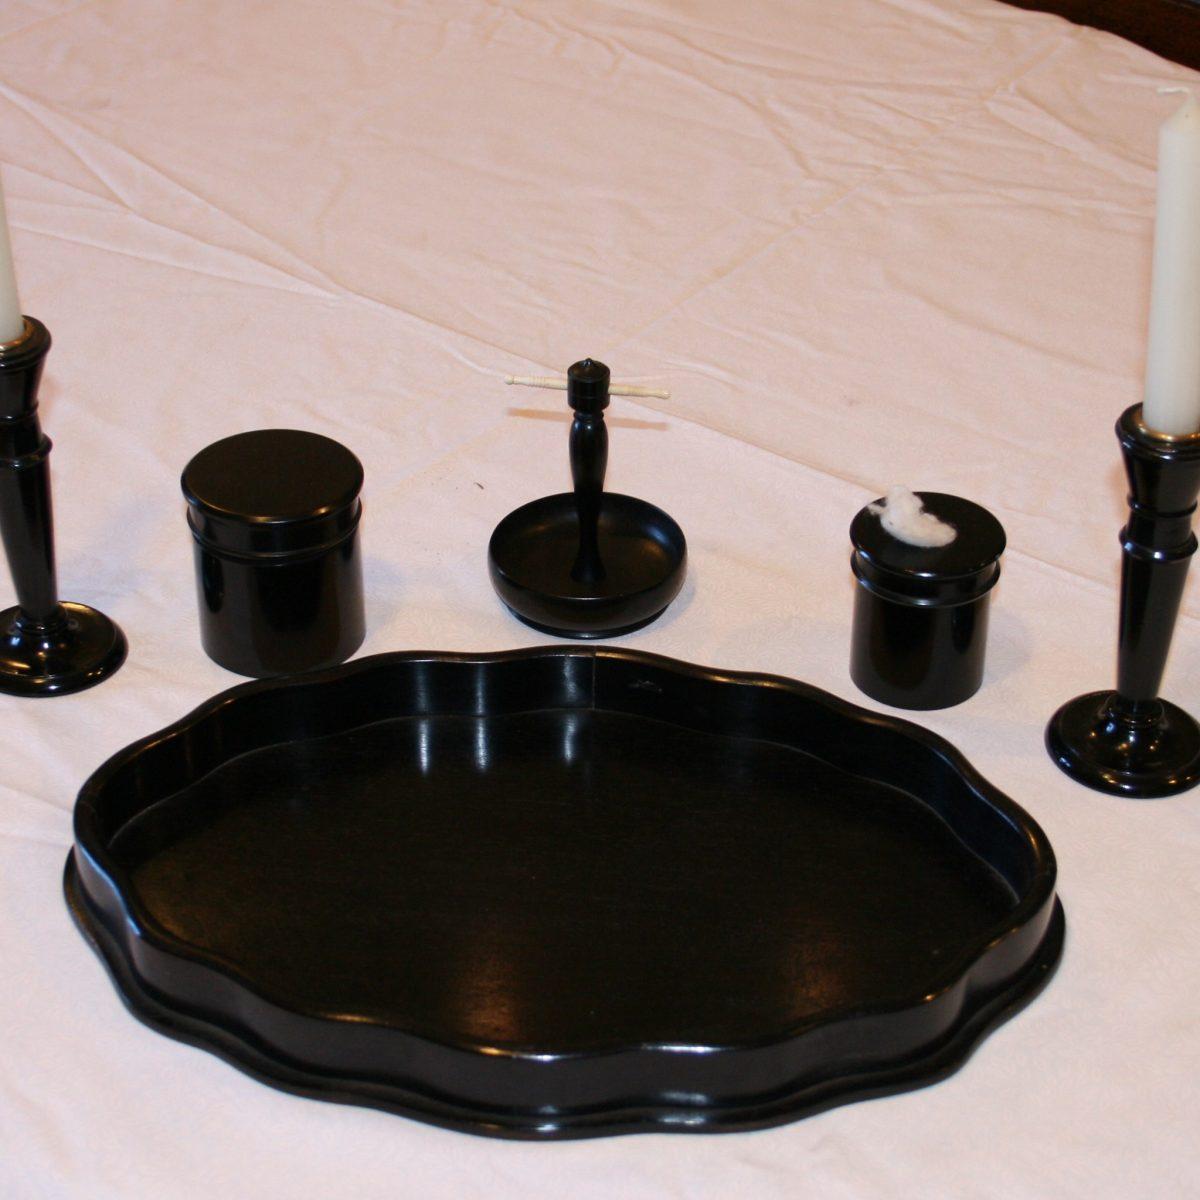 5 piece dressing table set/williamsantiquesbedford